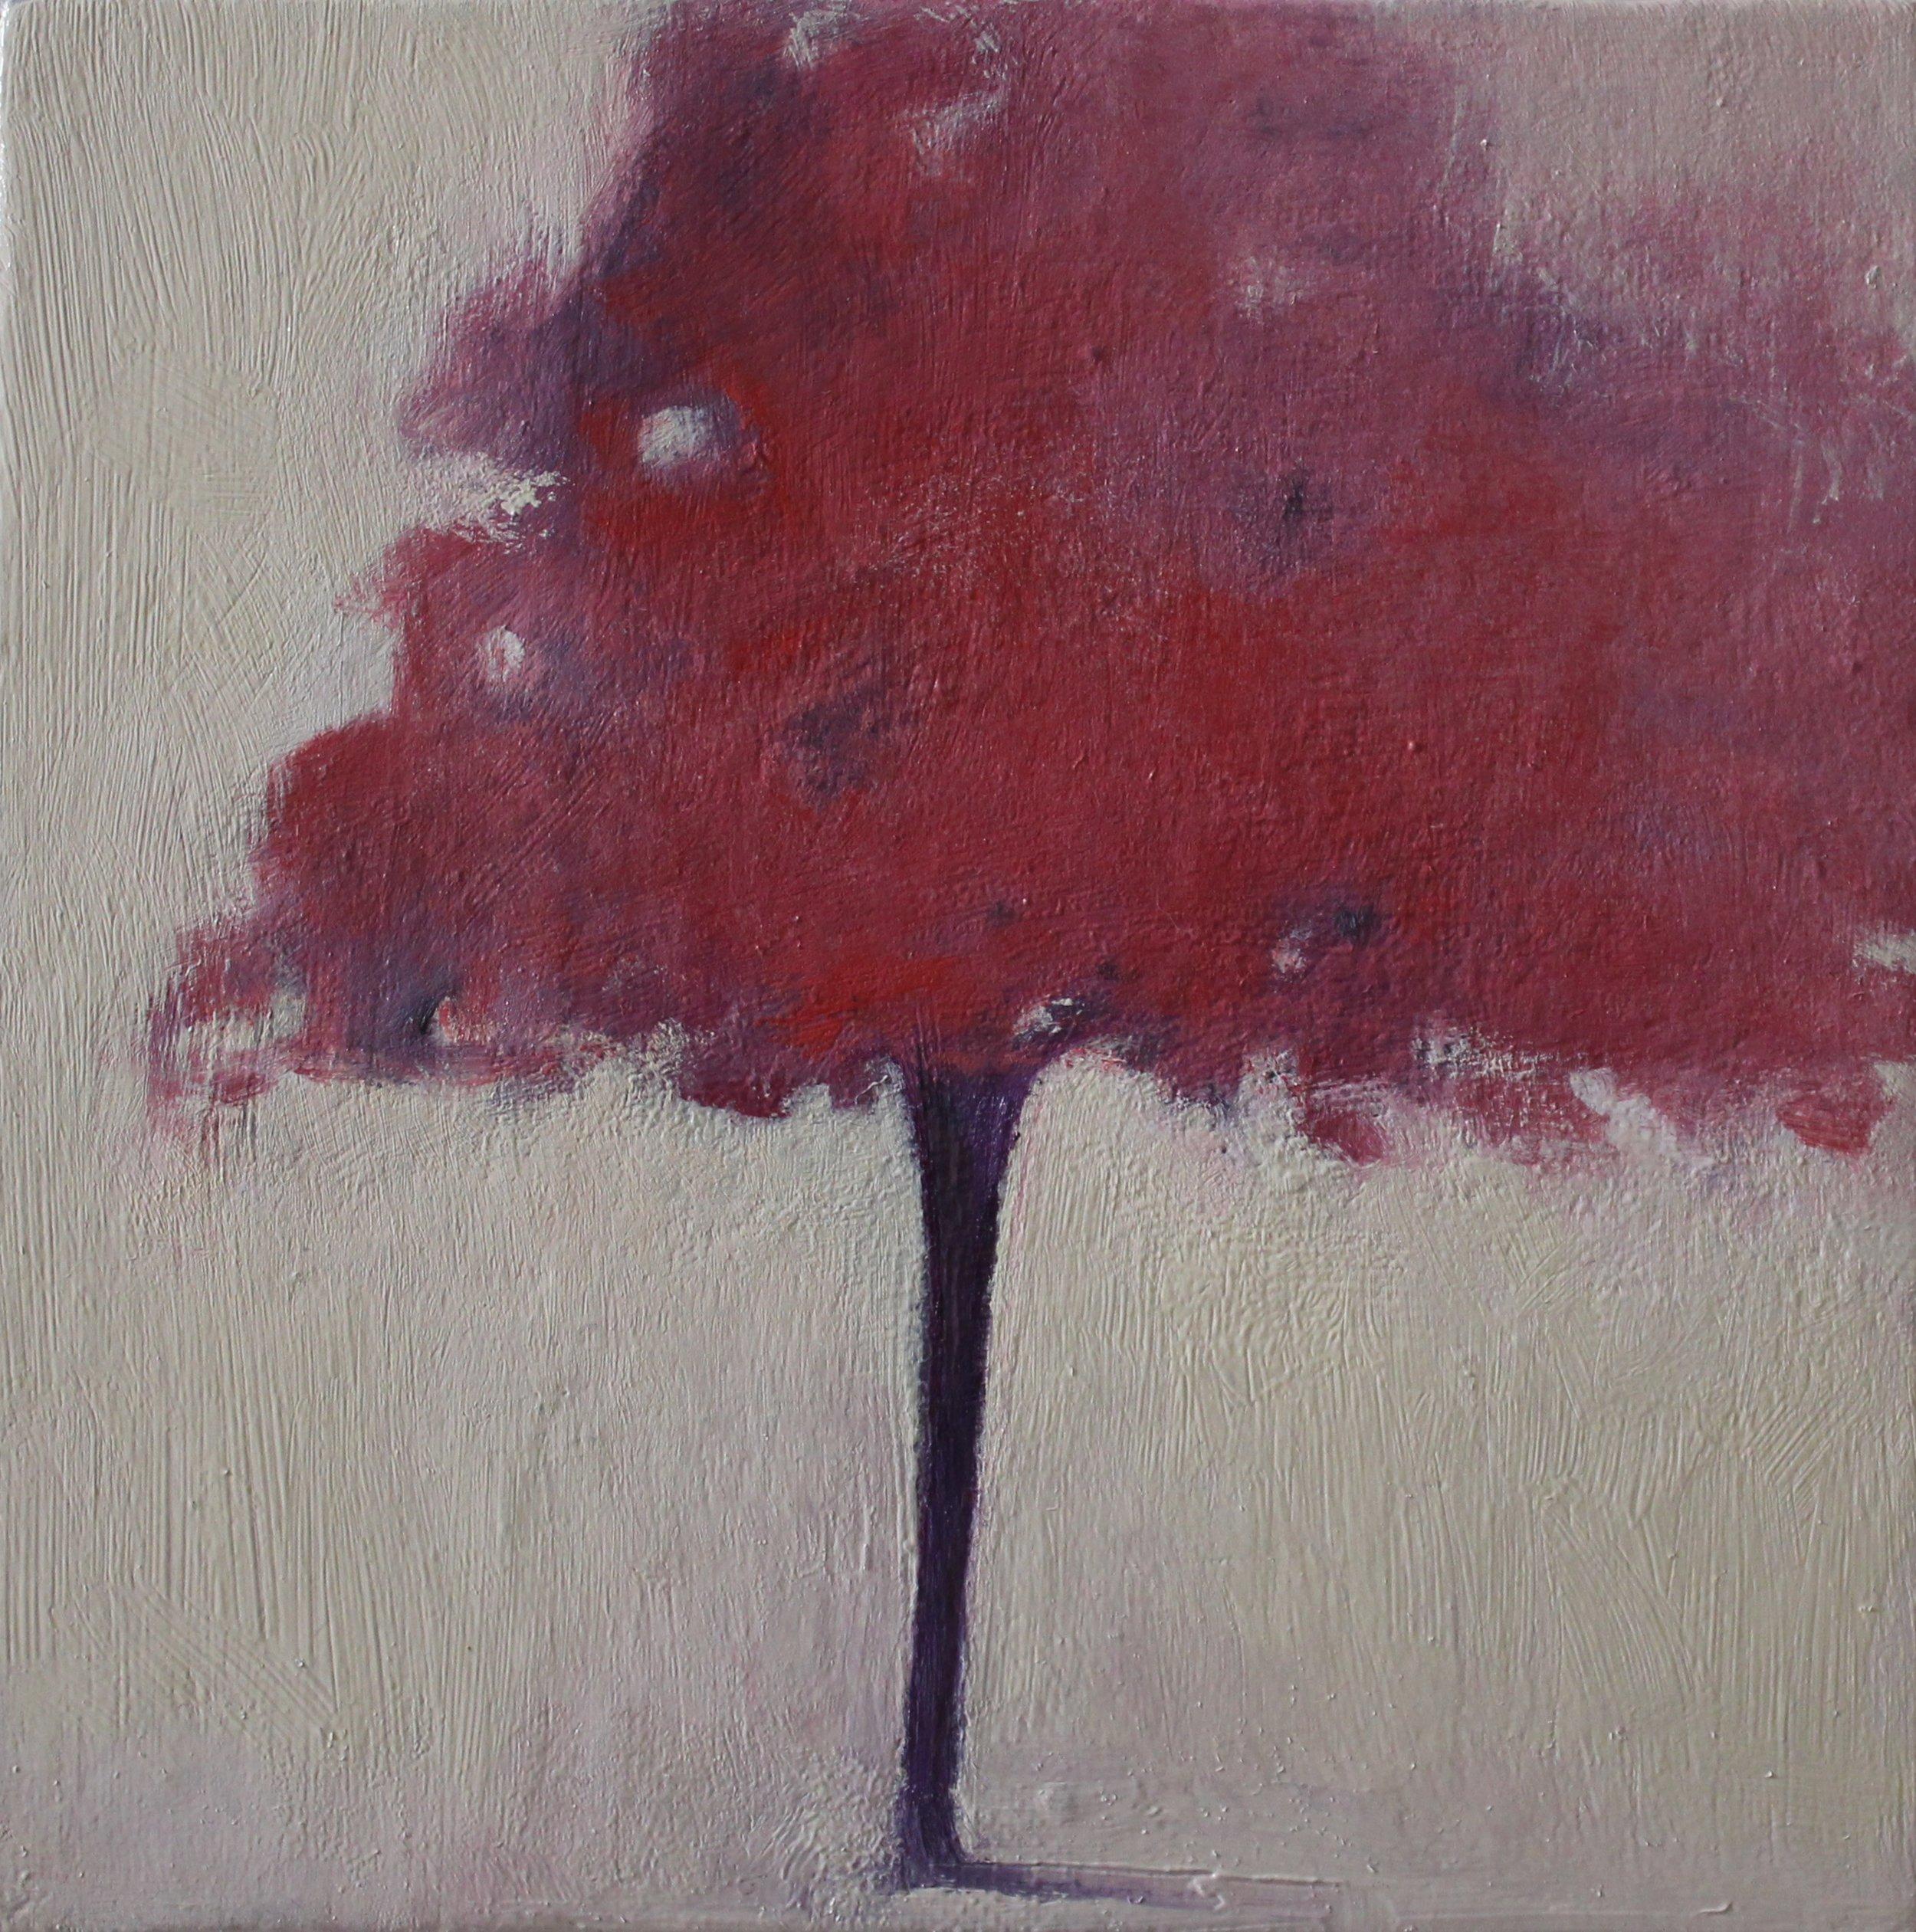 Title: Blossom Tree (II)  Size: 15 x 15 cm  Medium: Oil on canvas panel  Price: £260